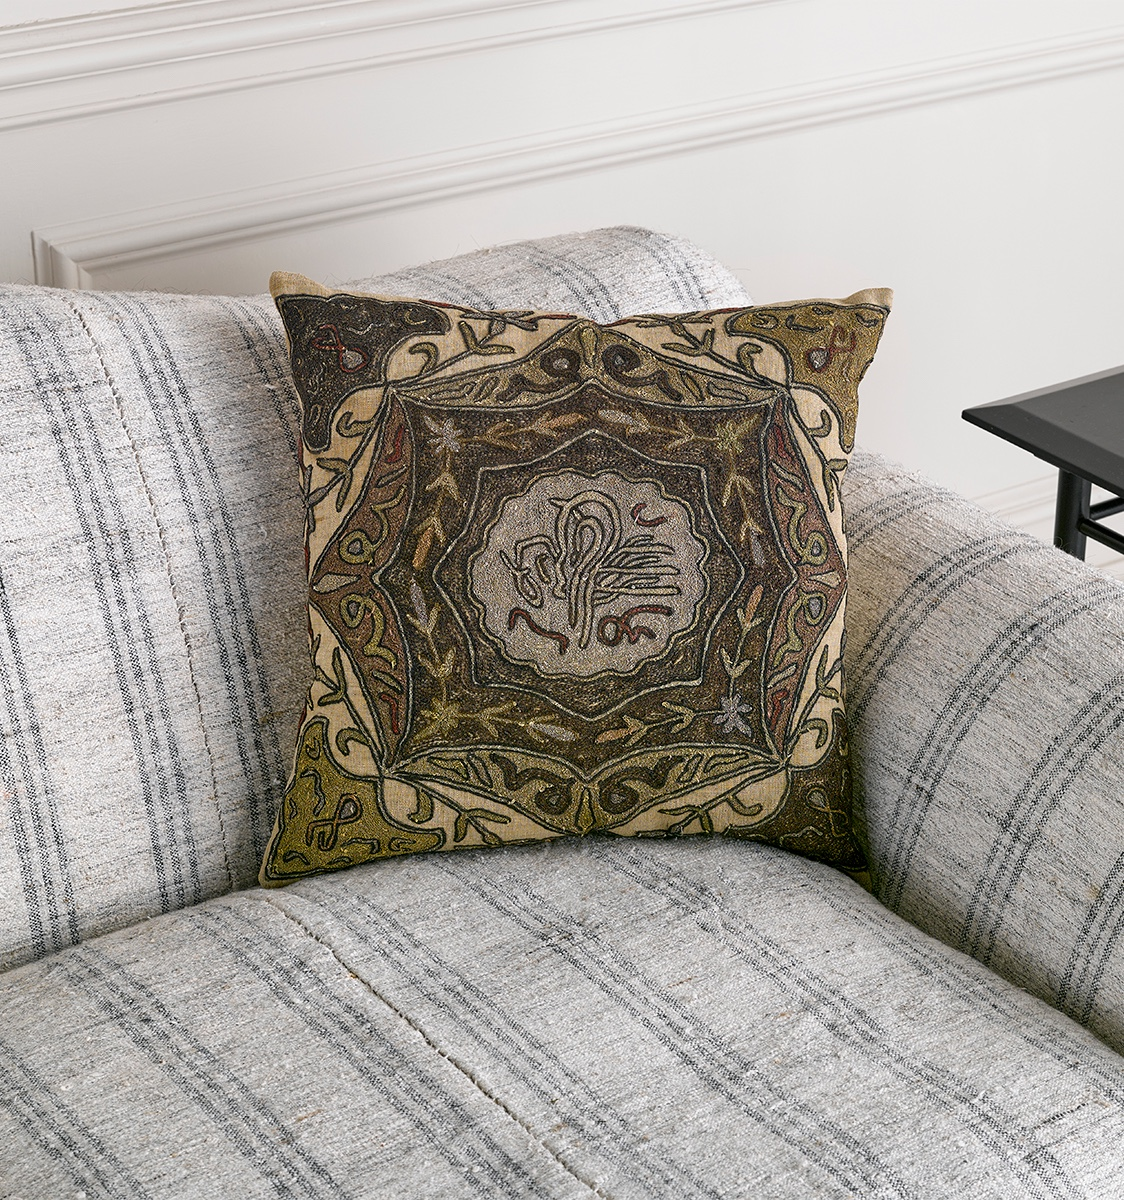 Medium Brown Embroidered Antique Fabric Cushion